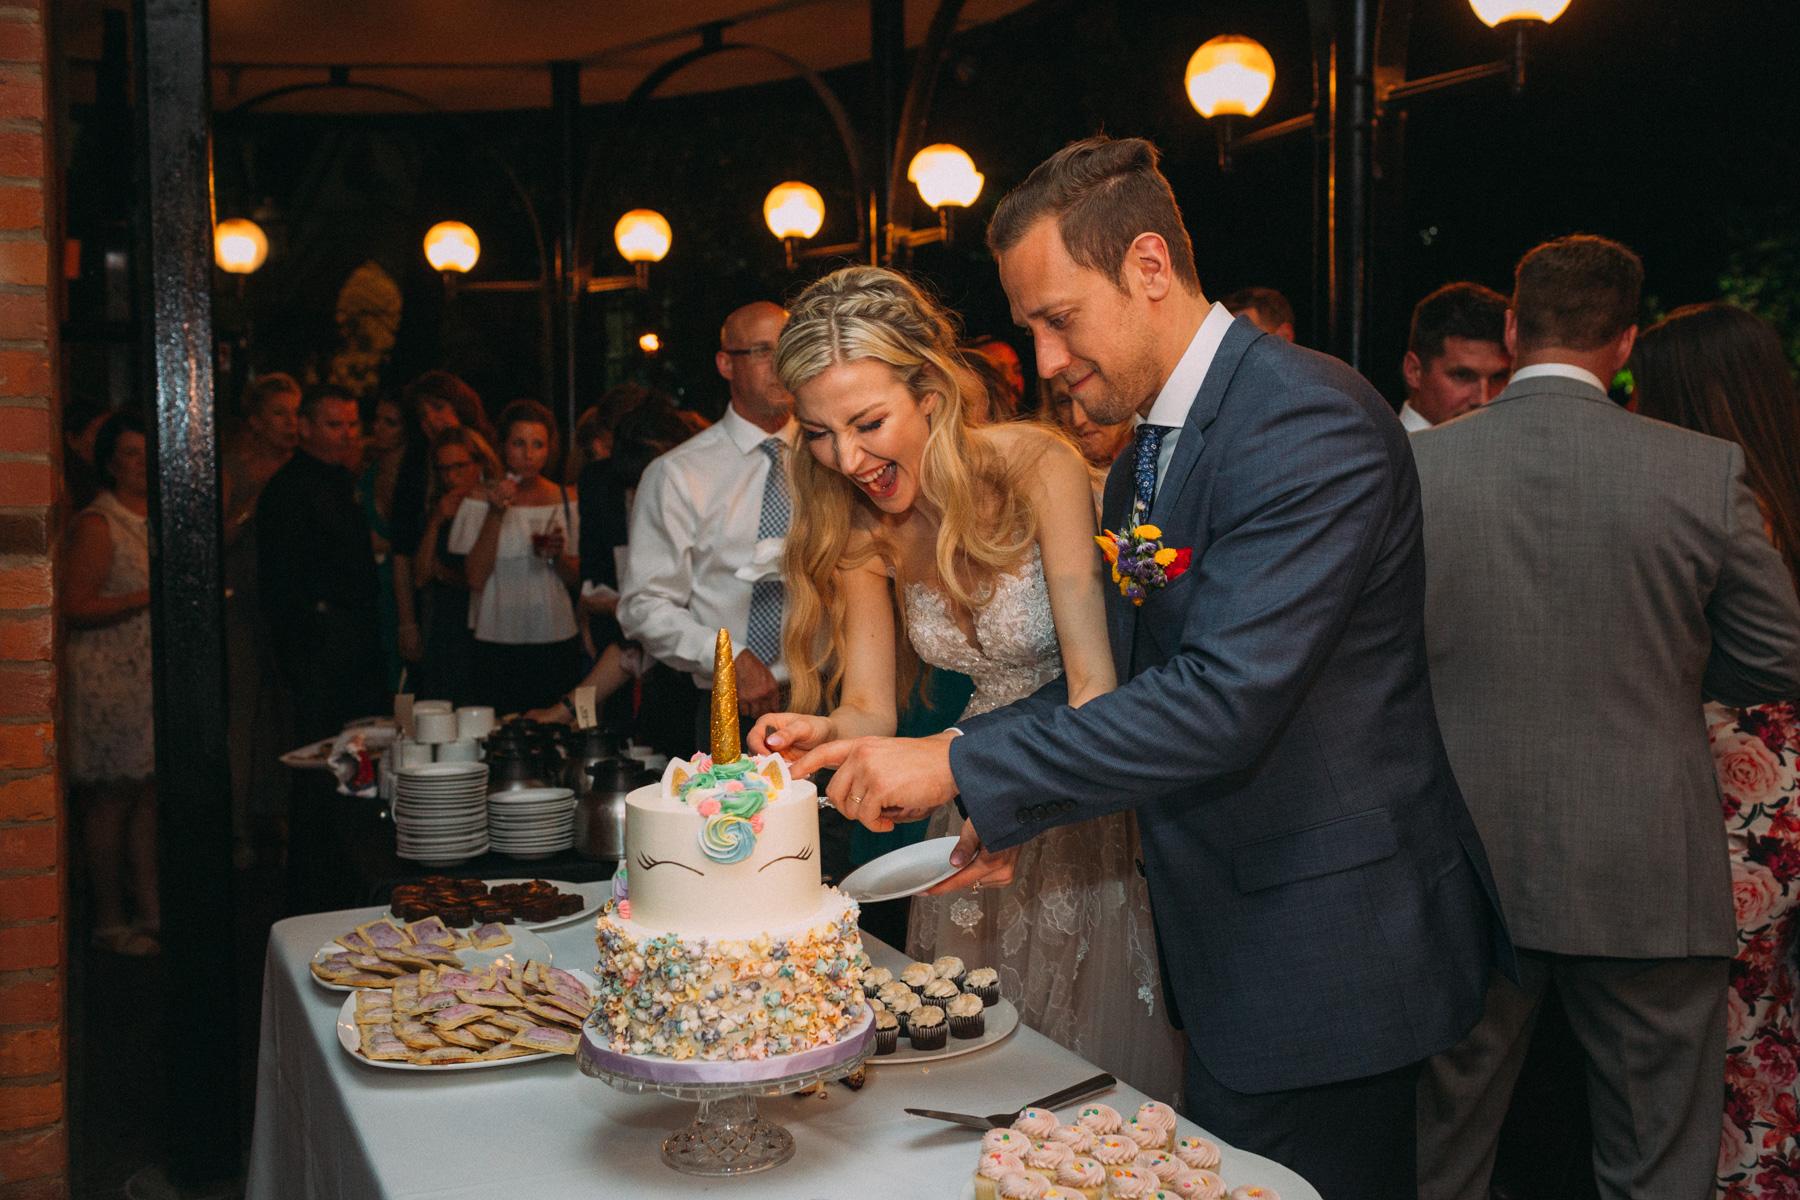 La-Maquette-wedding-by-Toronto-modern-wedding-photographer-Sam-Wong_46.jpg